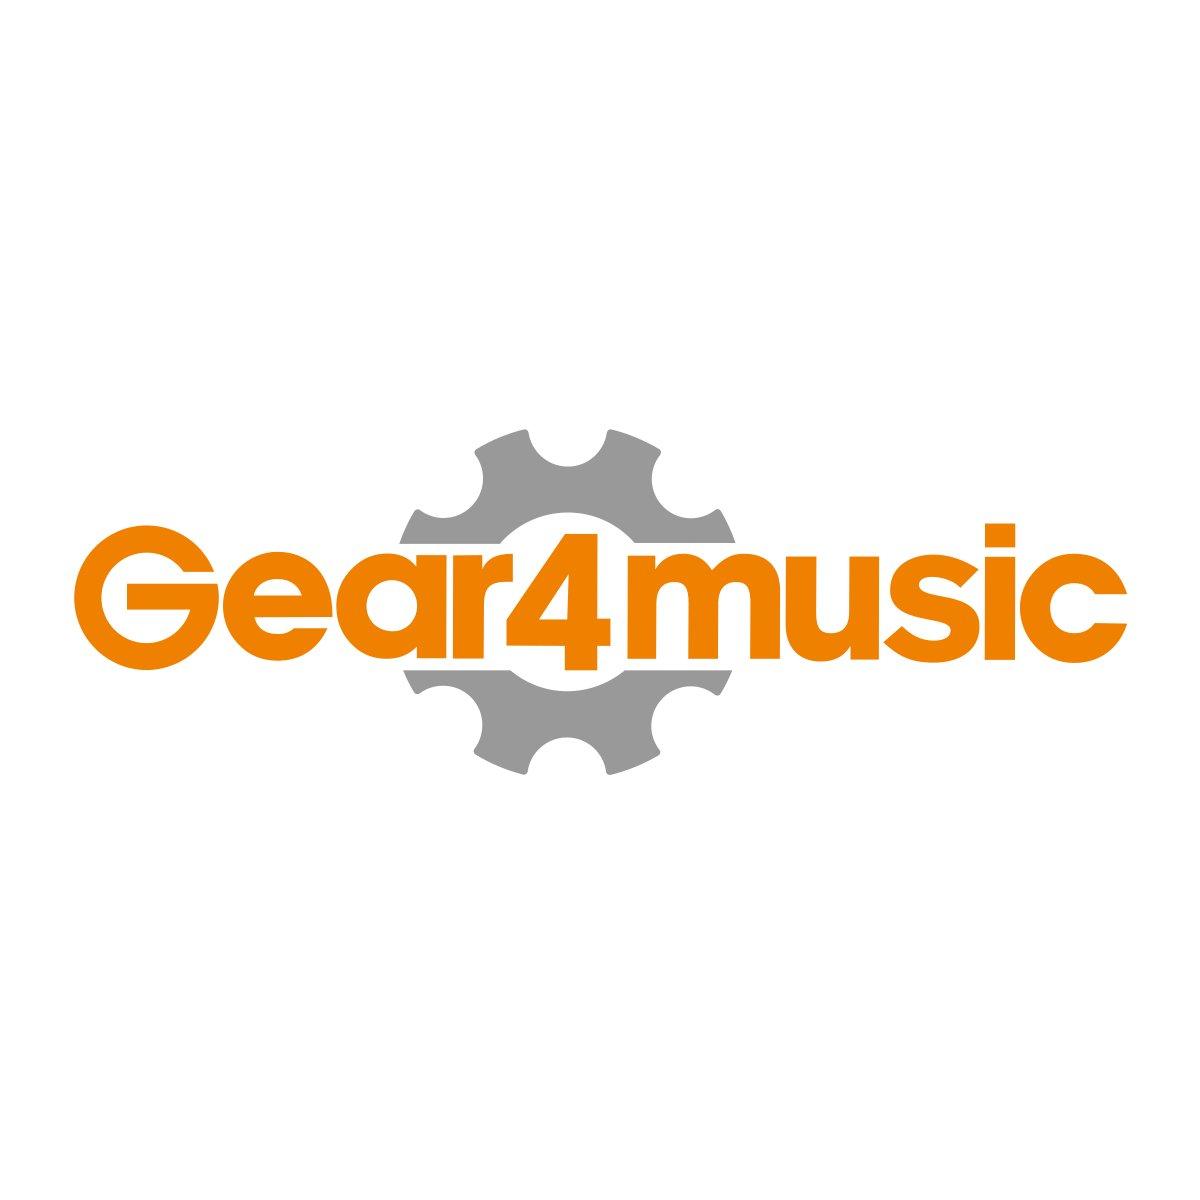 LA E-Gitarre von Gear4music, in Pink